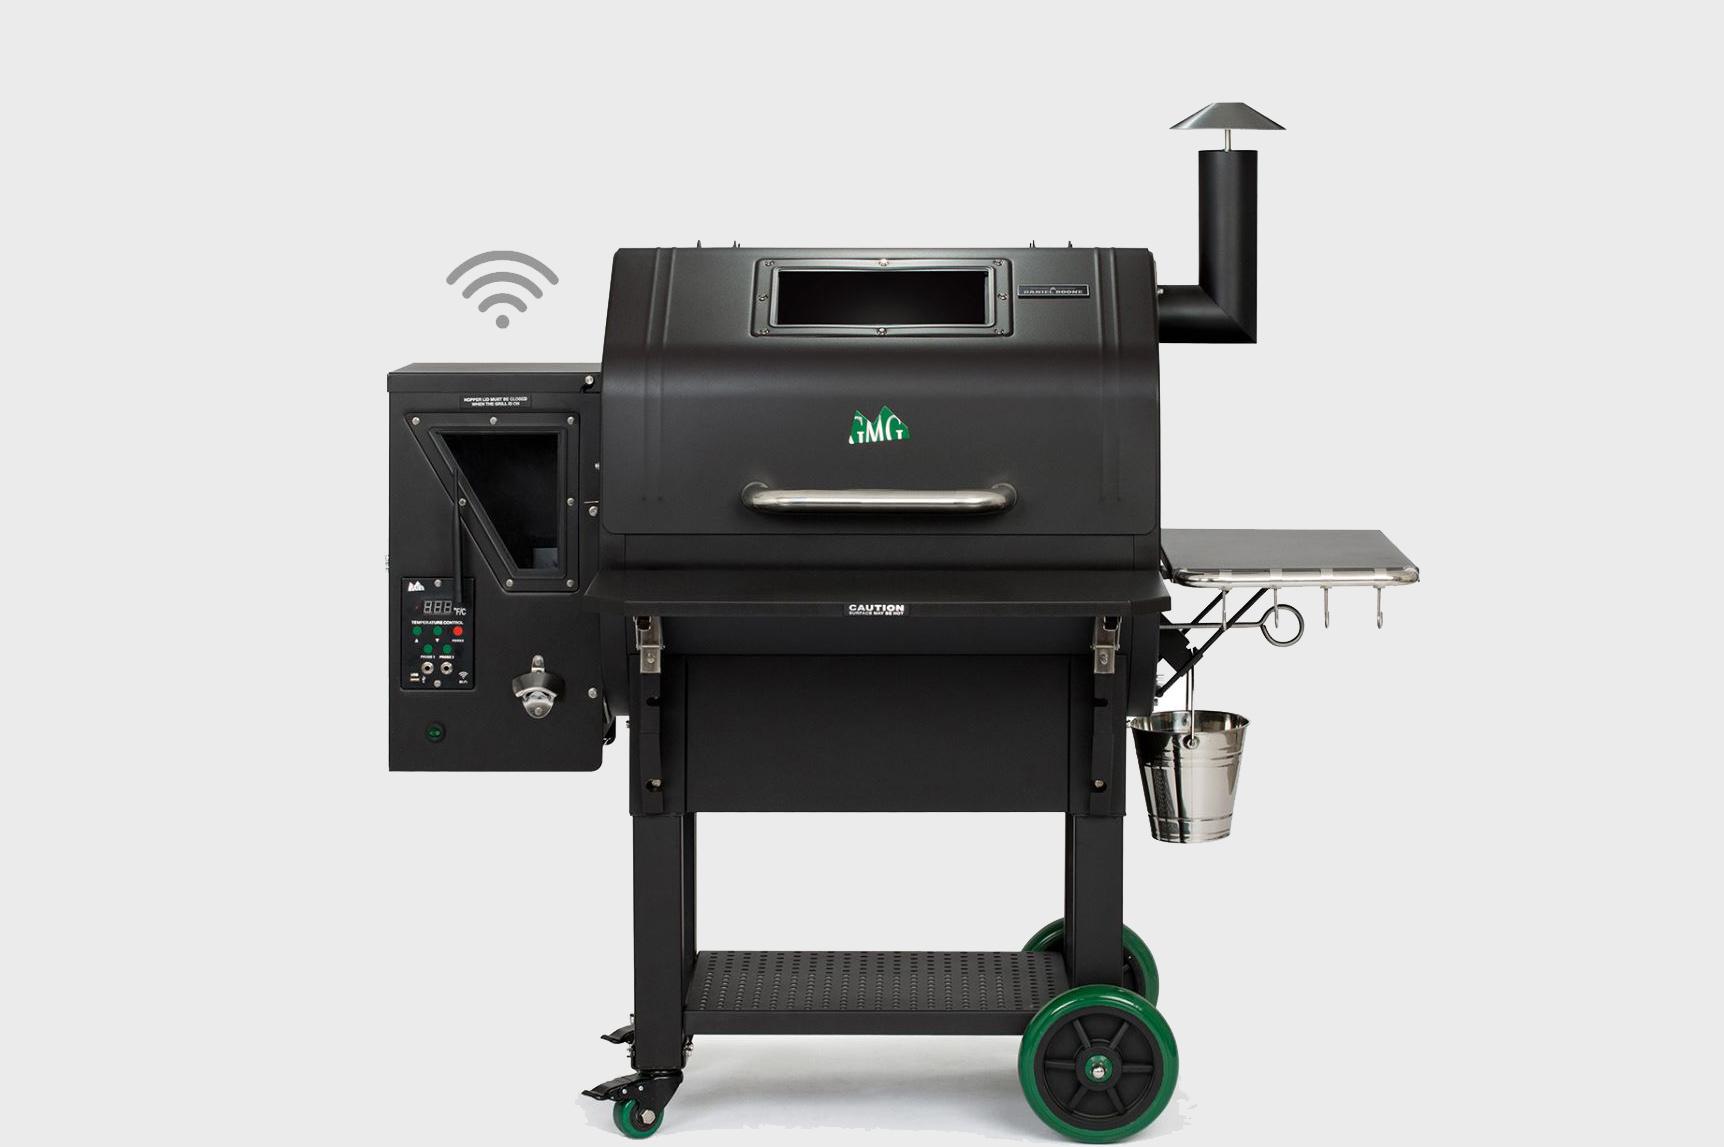 daniel boone pellet grill smoker prime plus